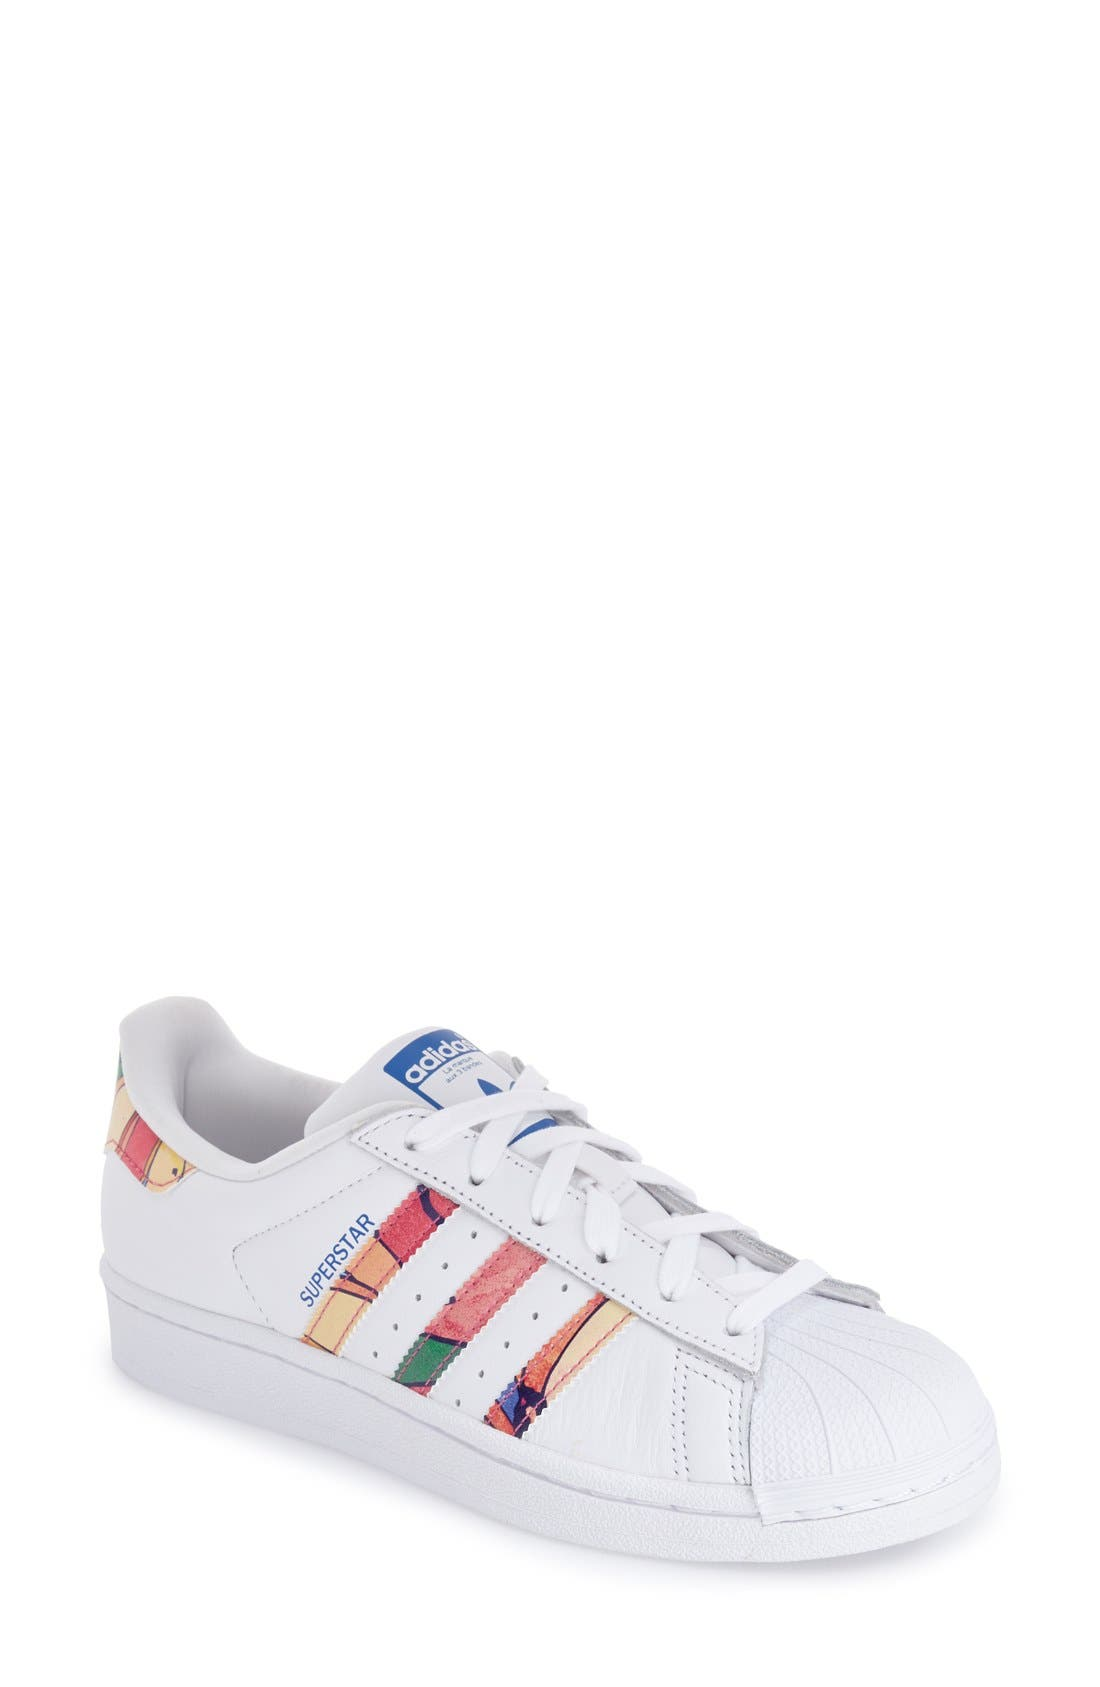 Alternate Image 1 Selected - adidas 'Superstar' Print Sneaker (Women)